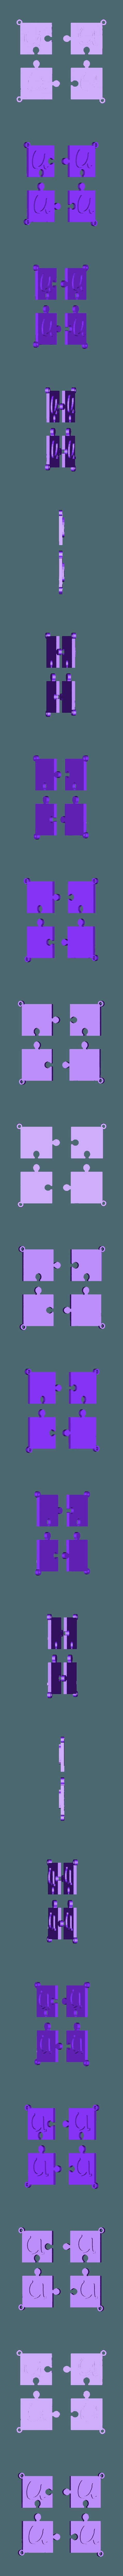 puzzle u.stl Download STL file puzzle key ring • 3D printing design, catf3d